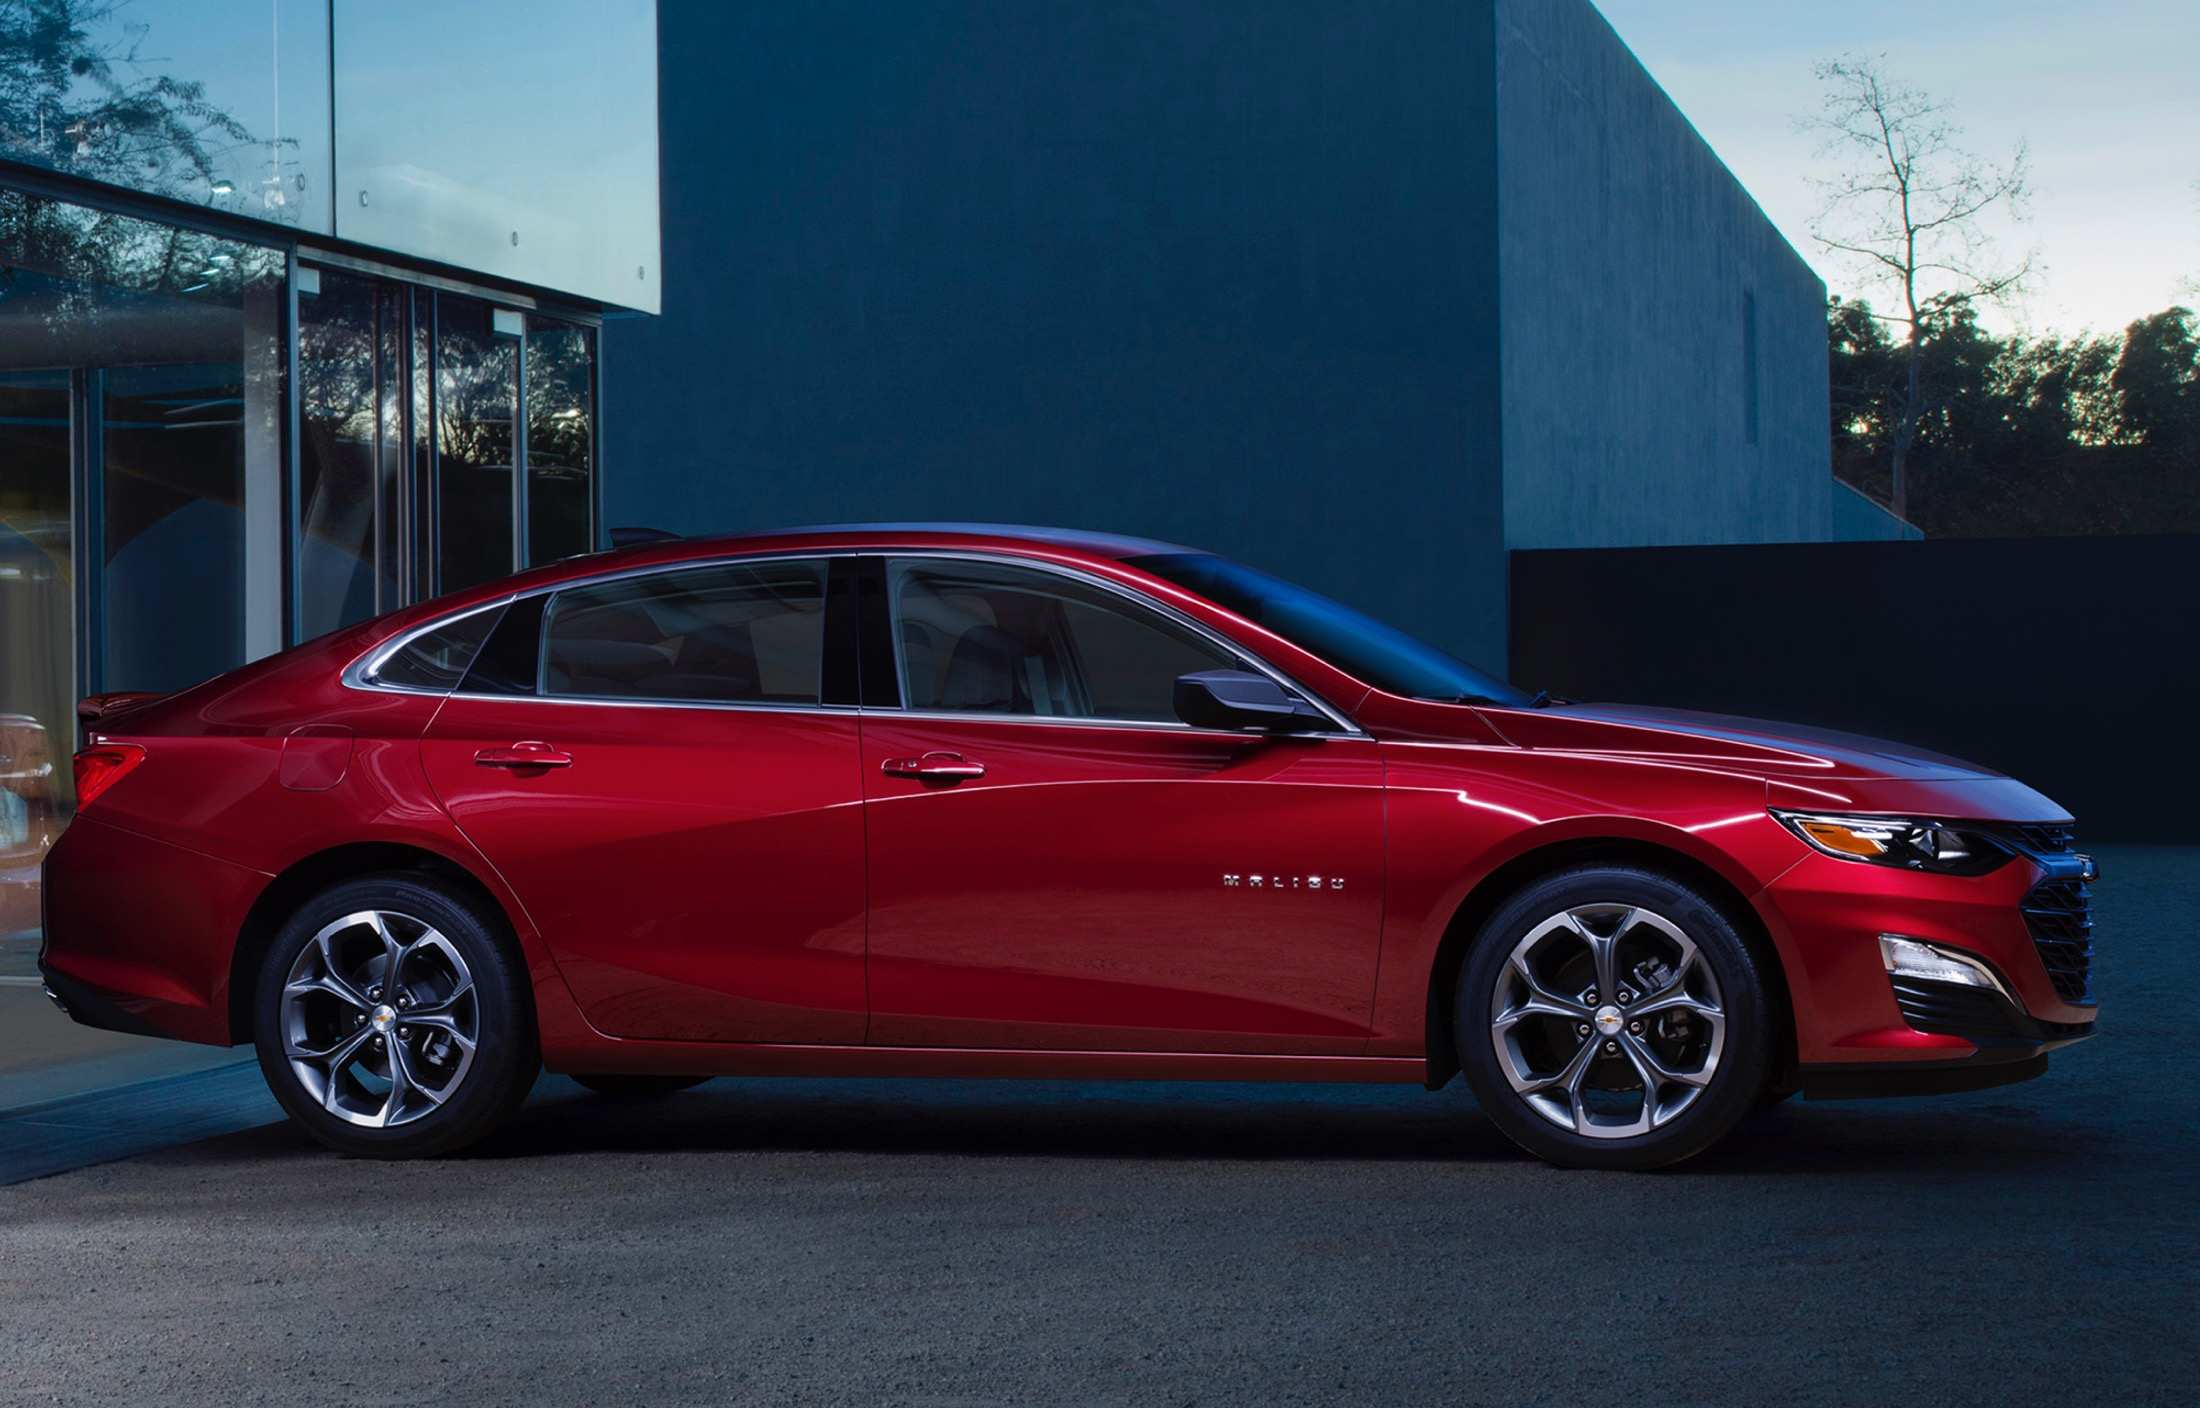 21 All New The Chevrolet Malibu 2019 Price Rumors Specs with The Chevrolet Malibu 2019 Price Rumors